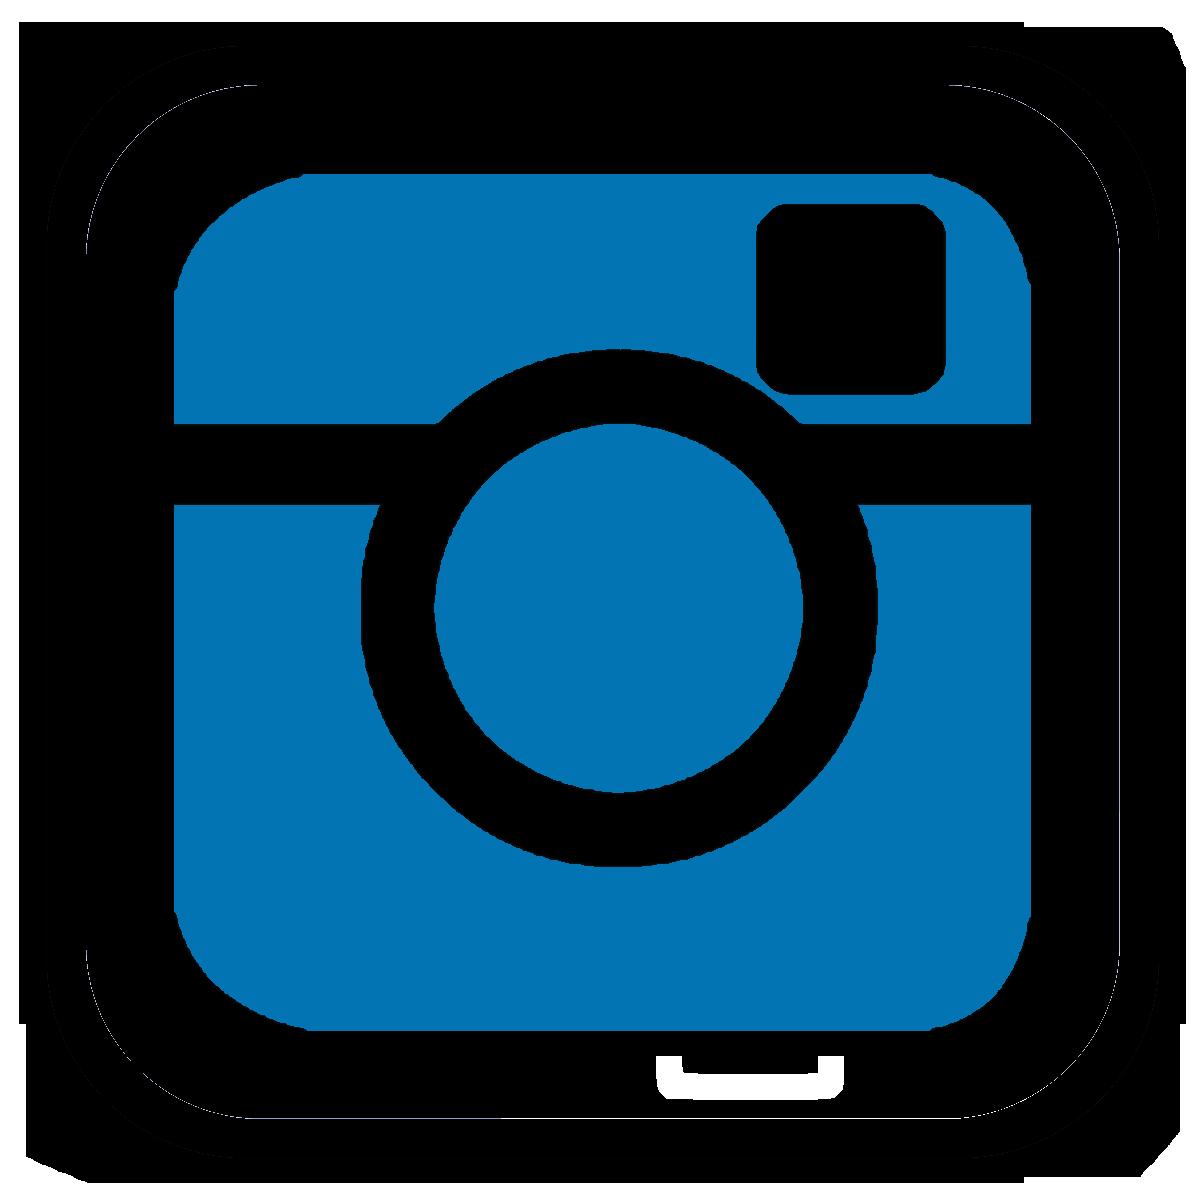 Black and white instagram logo free image